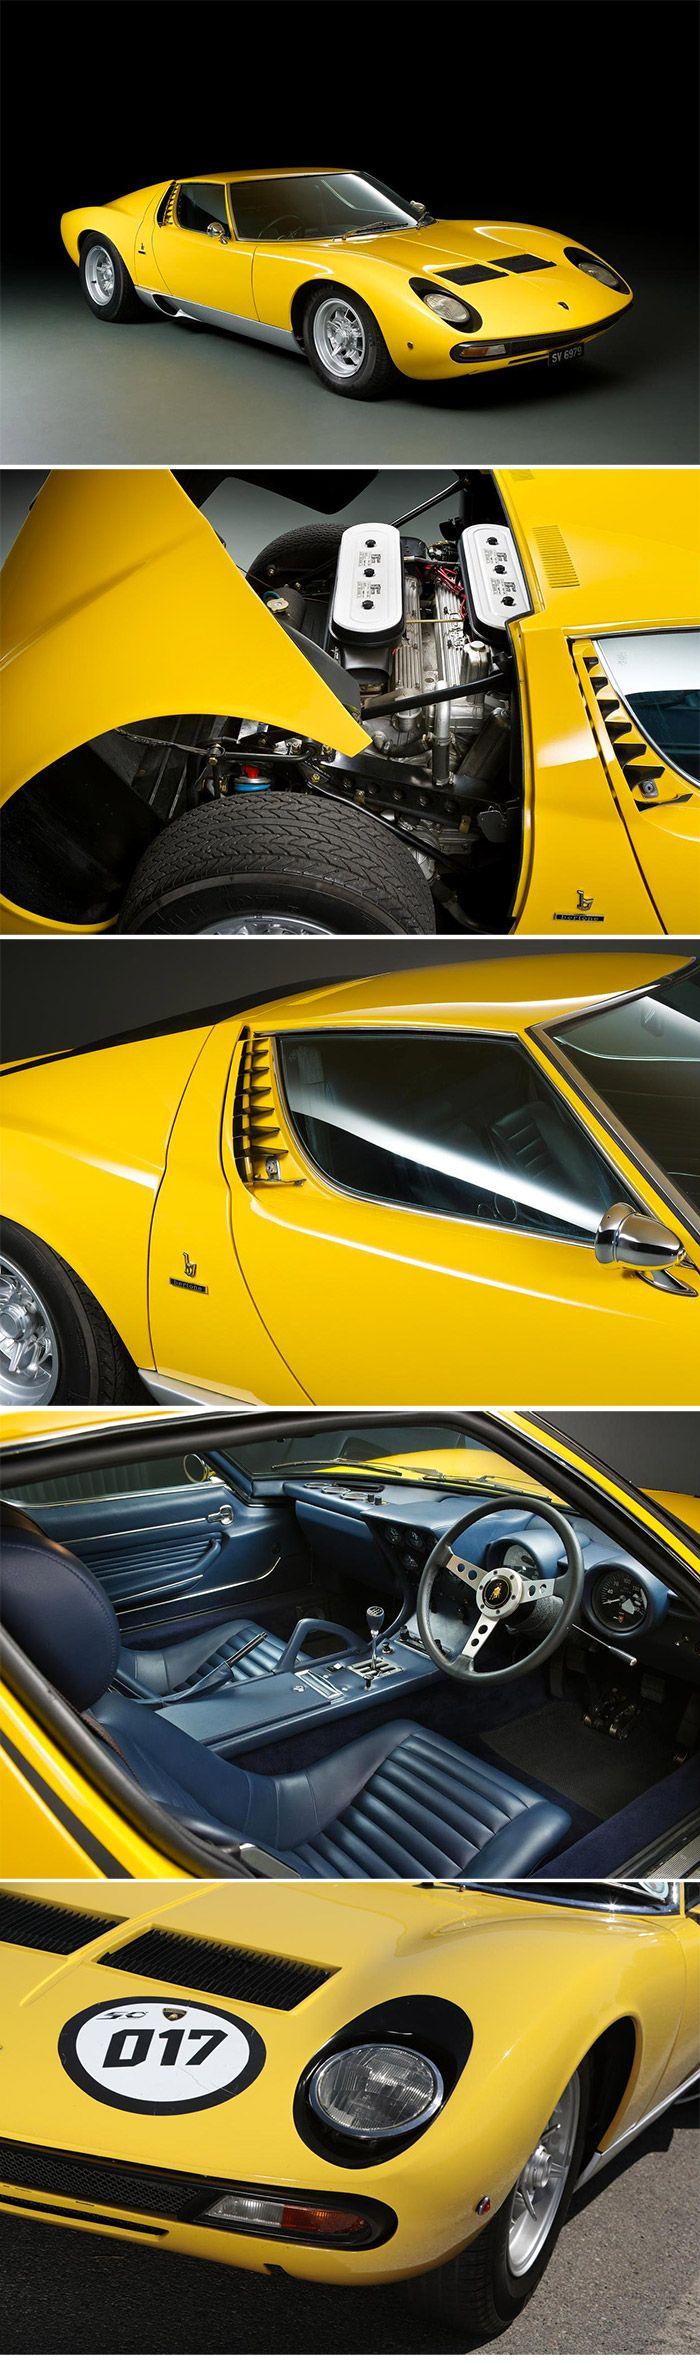 1972 Lamborghini Miura SV Coupé Coachwork by Carrozzeria Bertone